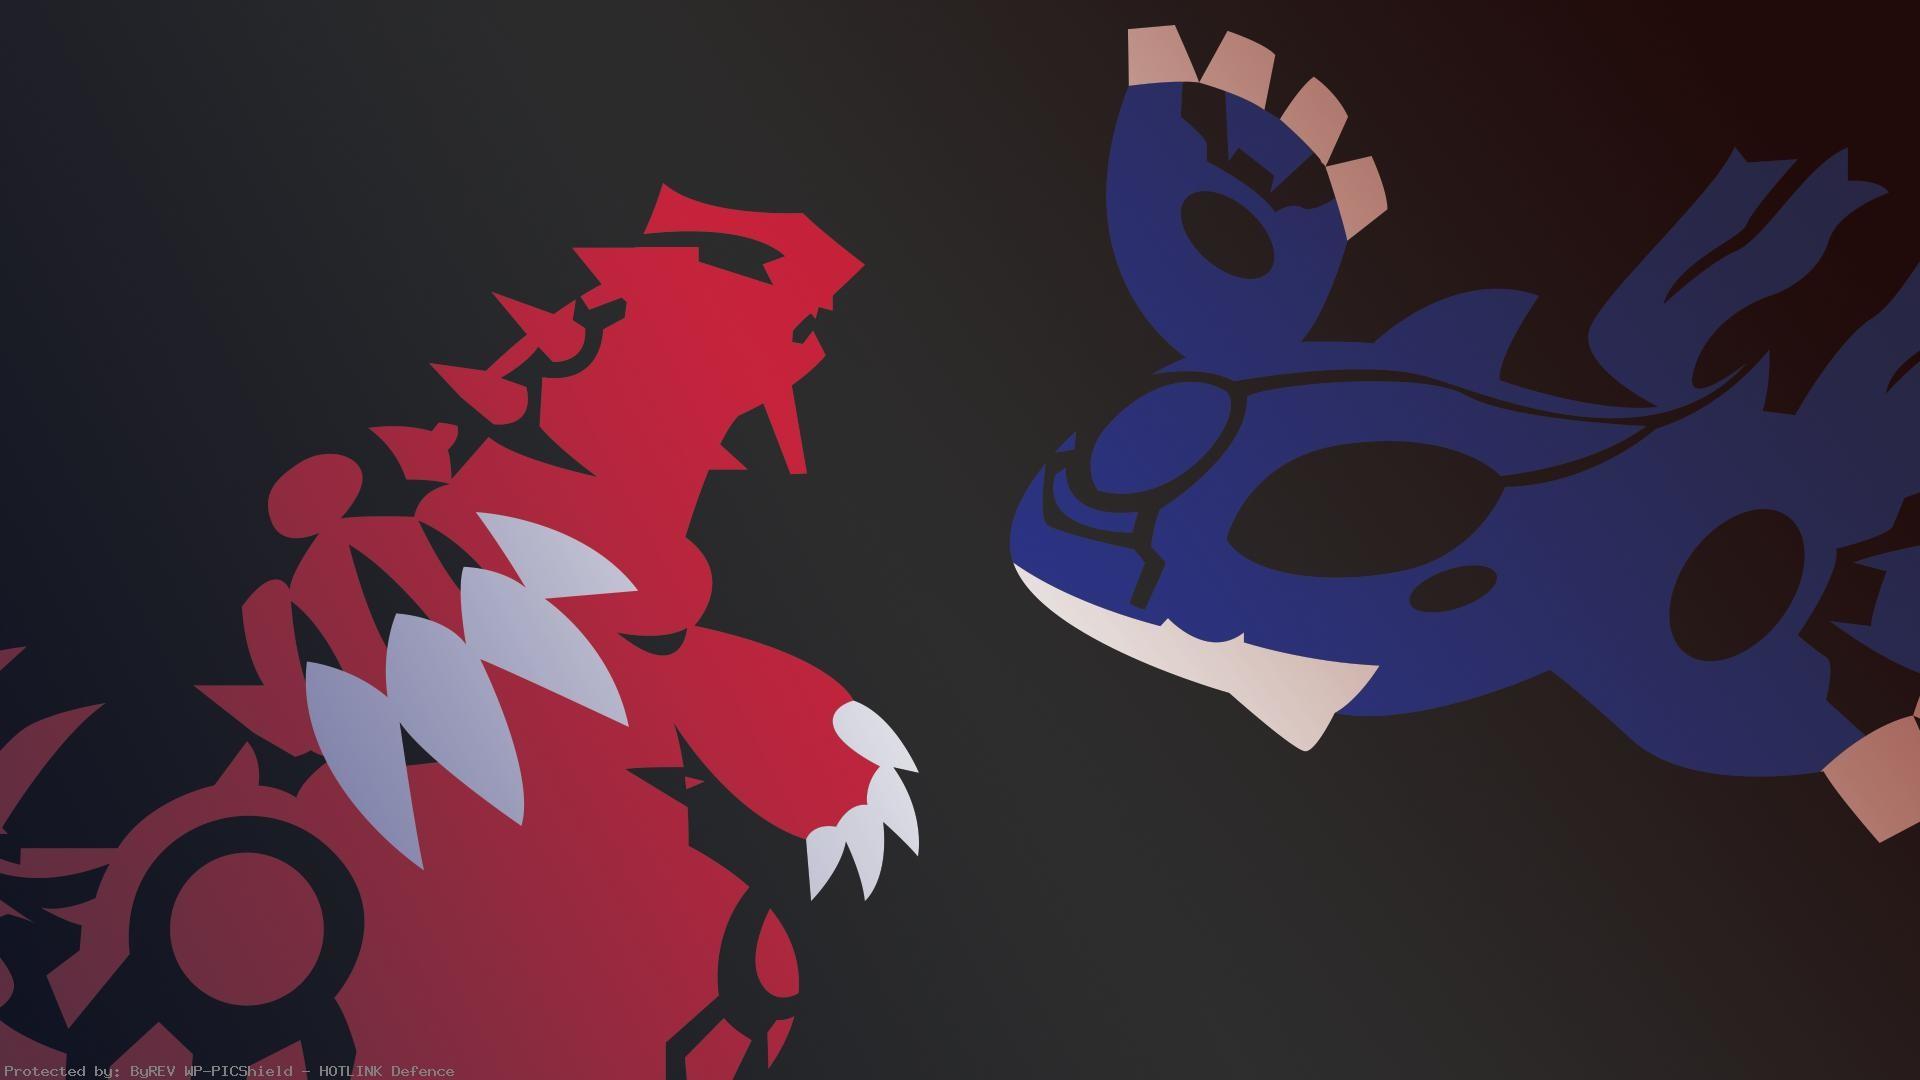 12+ Cool Pokemon Wallpapers HD